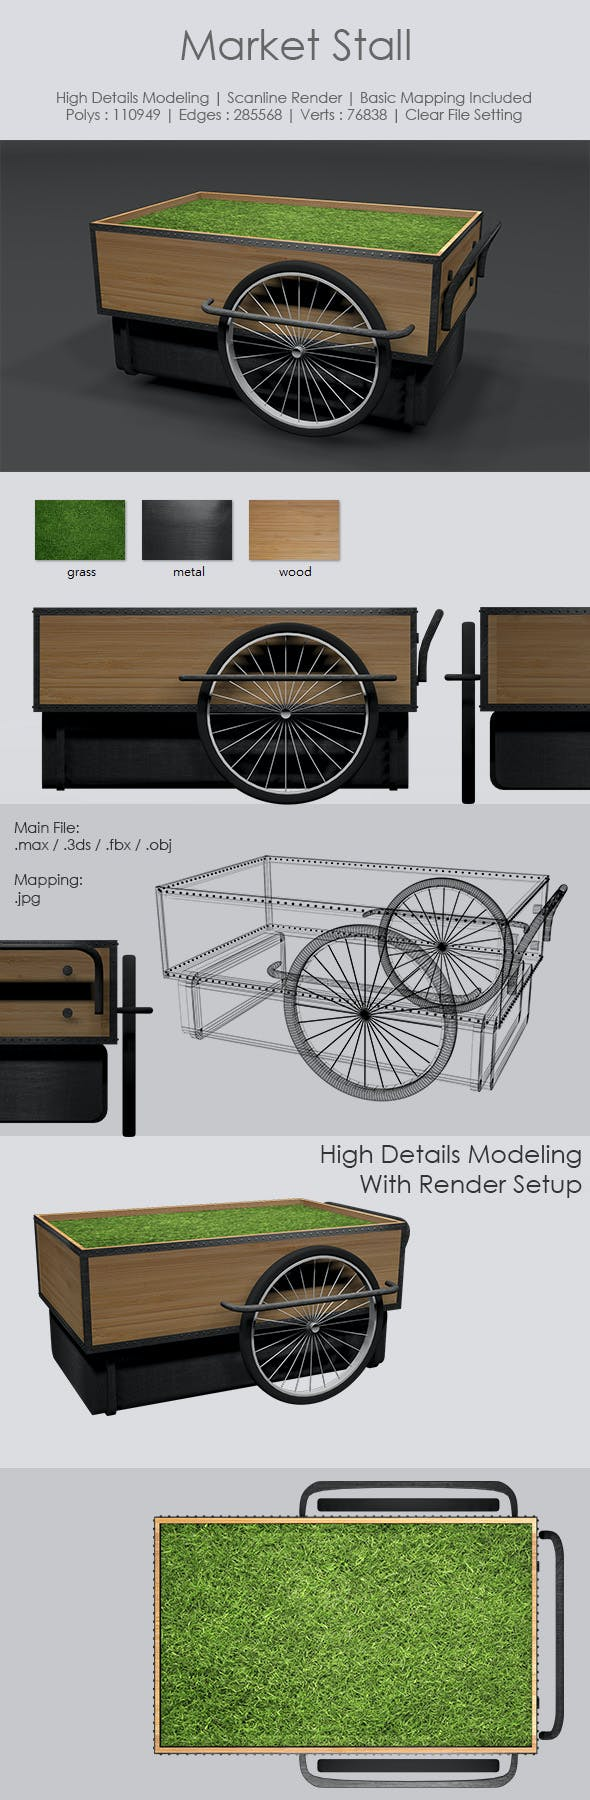 Market Stall - 3DOcean Item for Sale